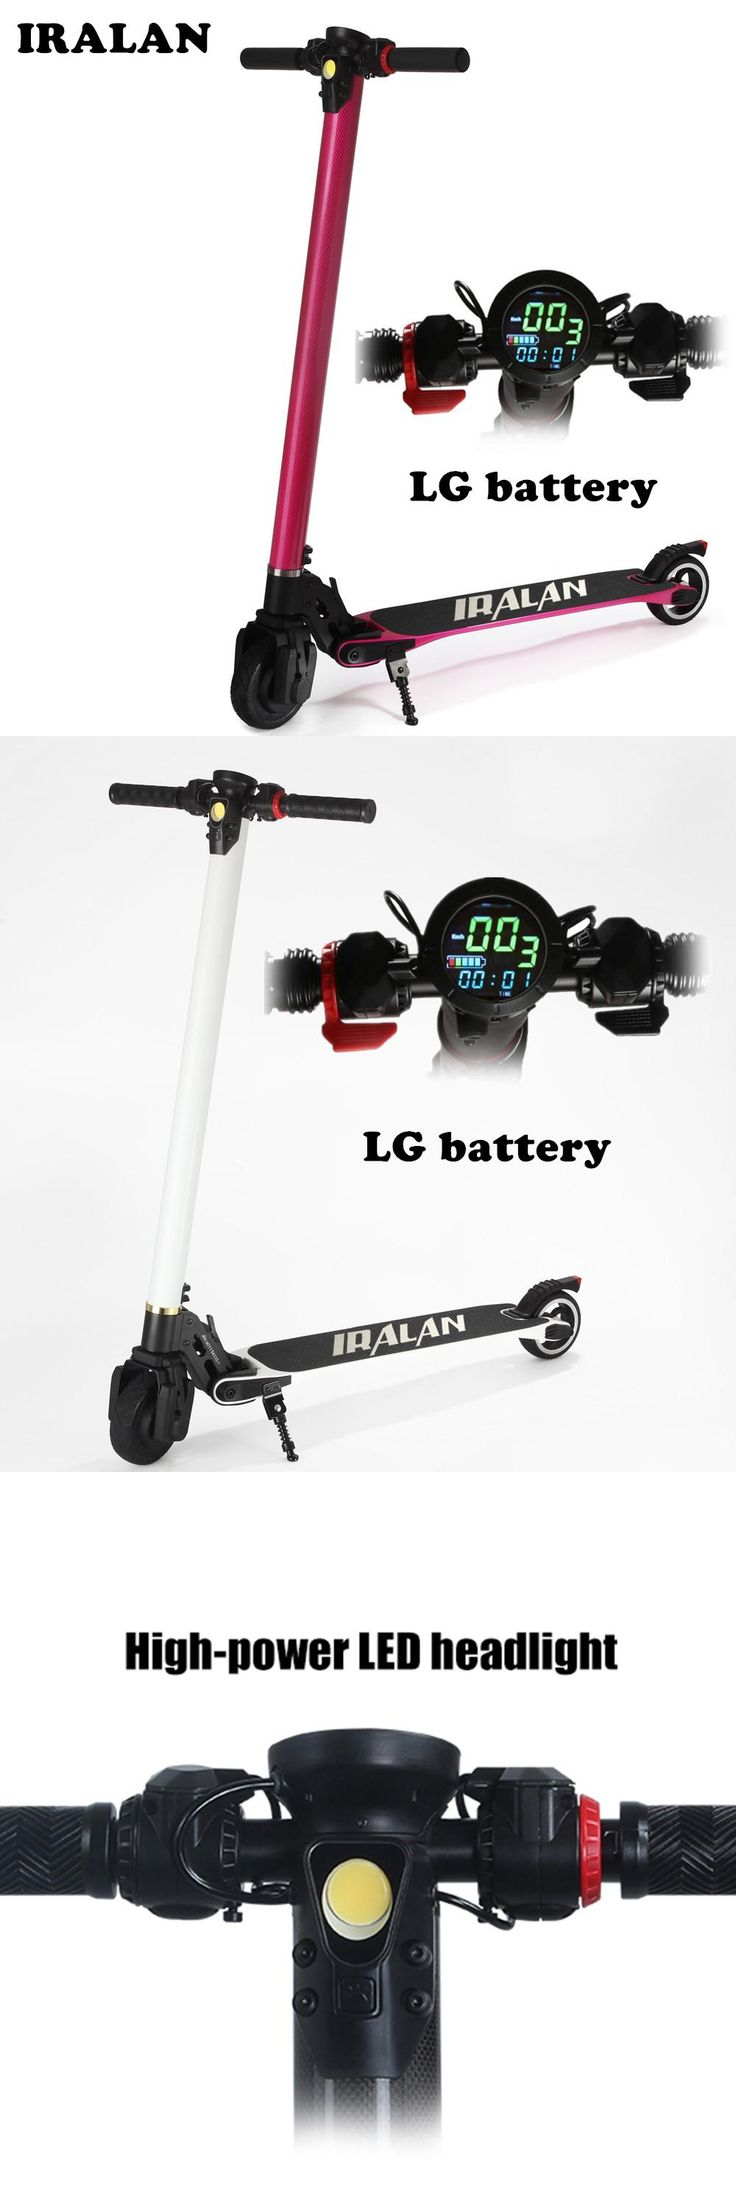 [Visit to Buy] RALAN S3 Upgrade Foldable Electric scooter Carbon Fiber Skateboard LG Battery bike Kick Scooter trottinette electrique adulte #Advertisement